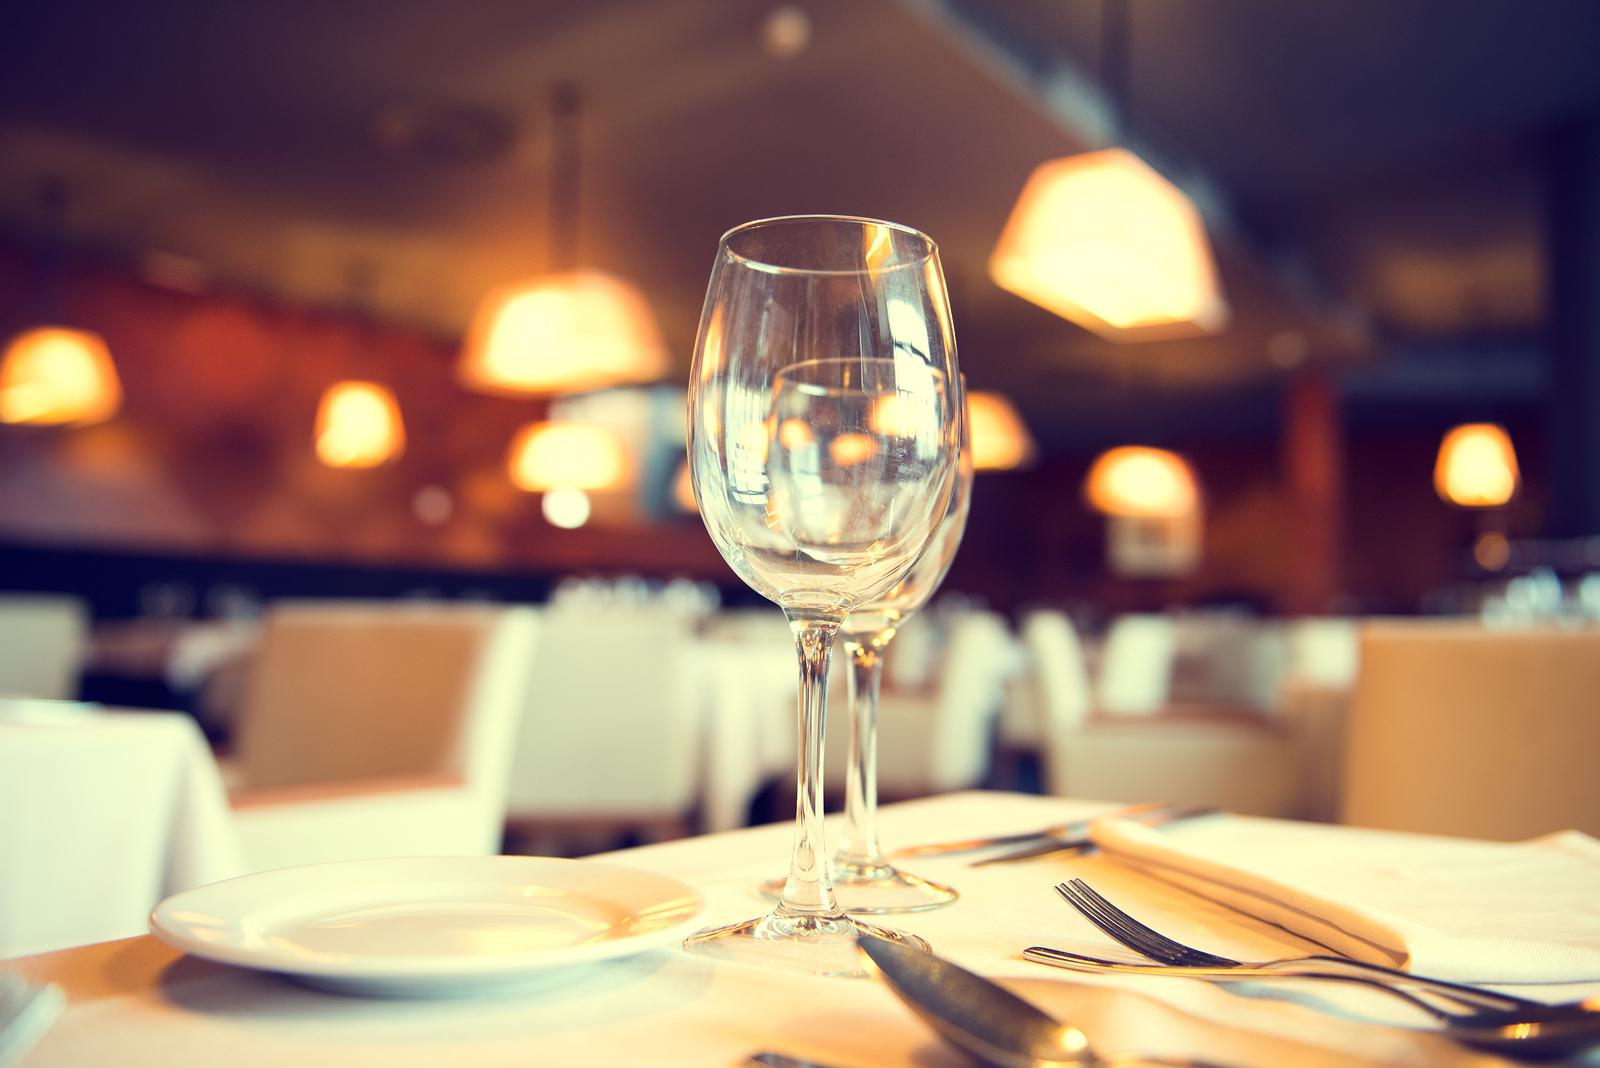 Served dinner table in a restaurant. Restaurant interior. Cozy r